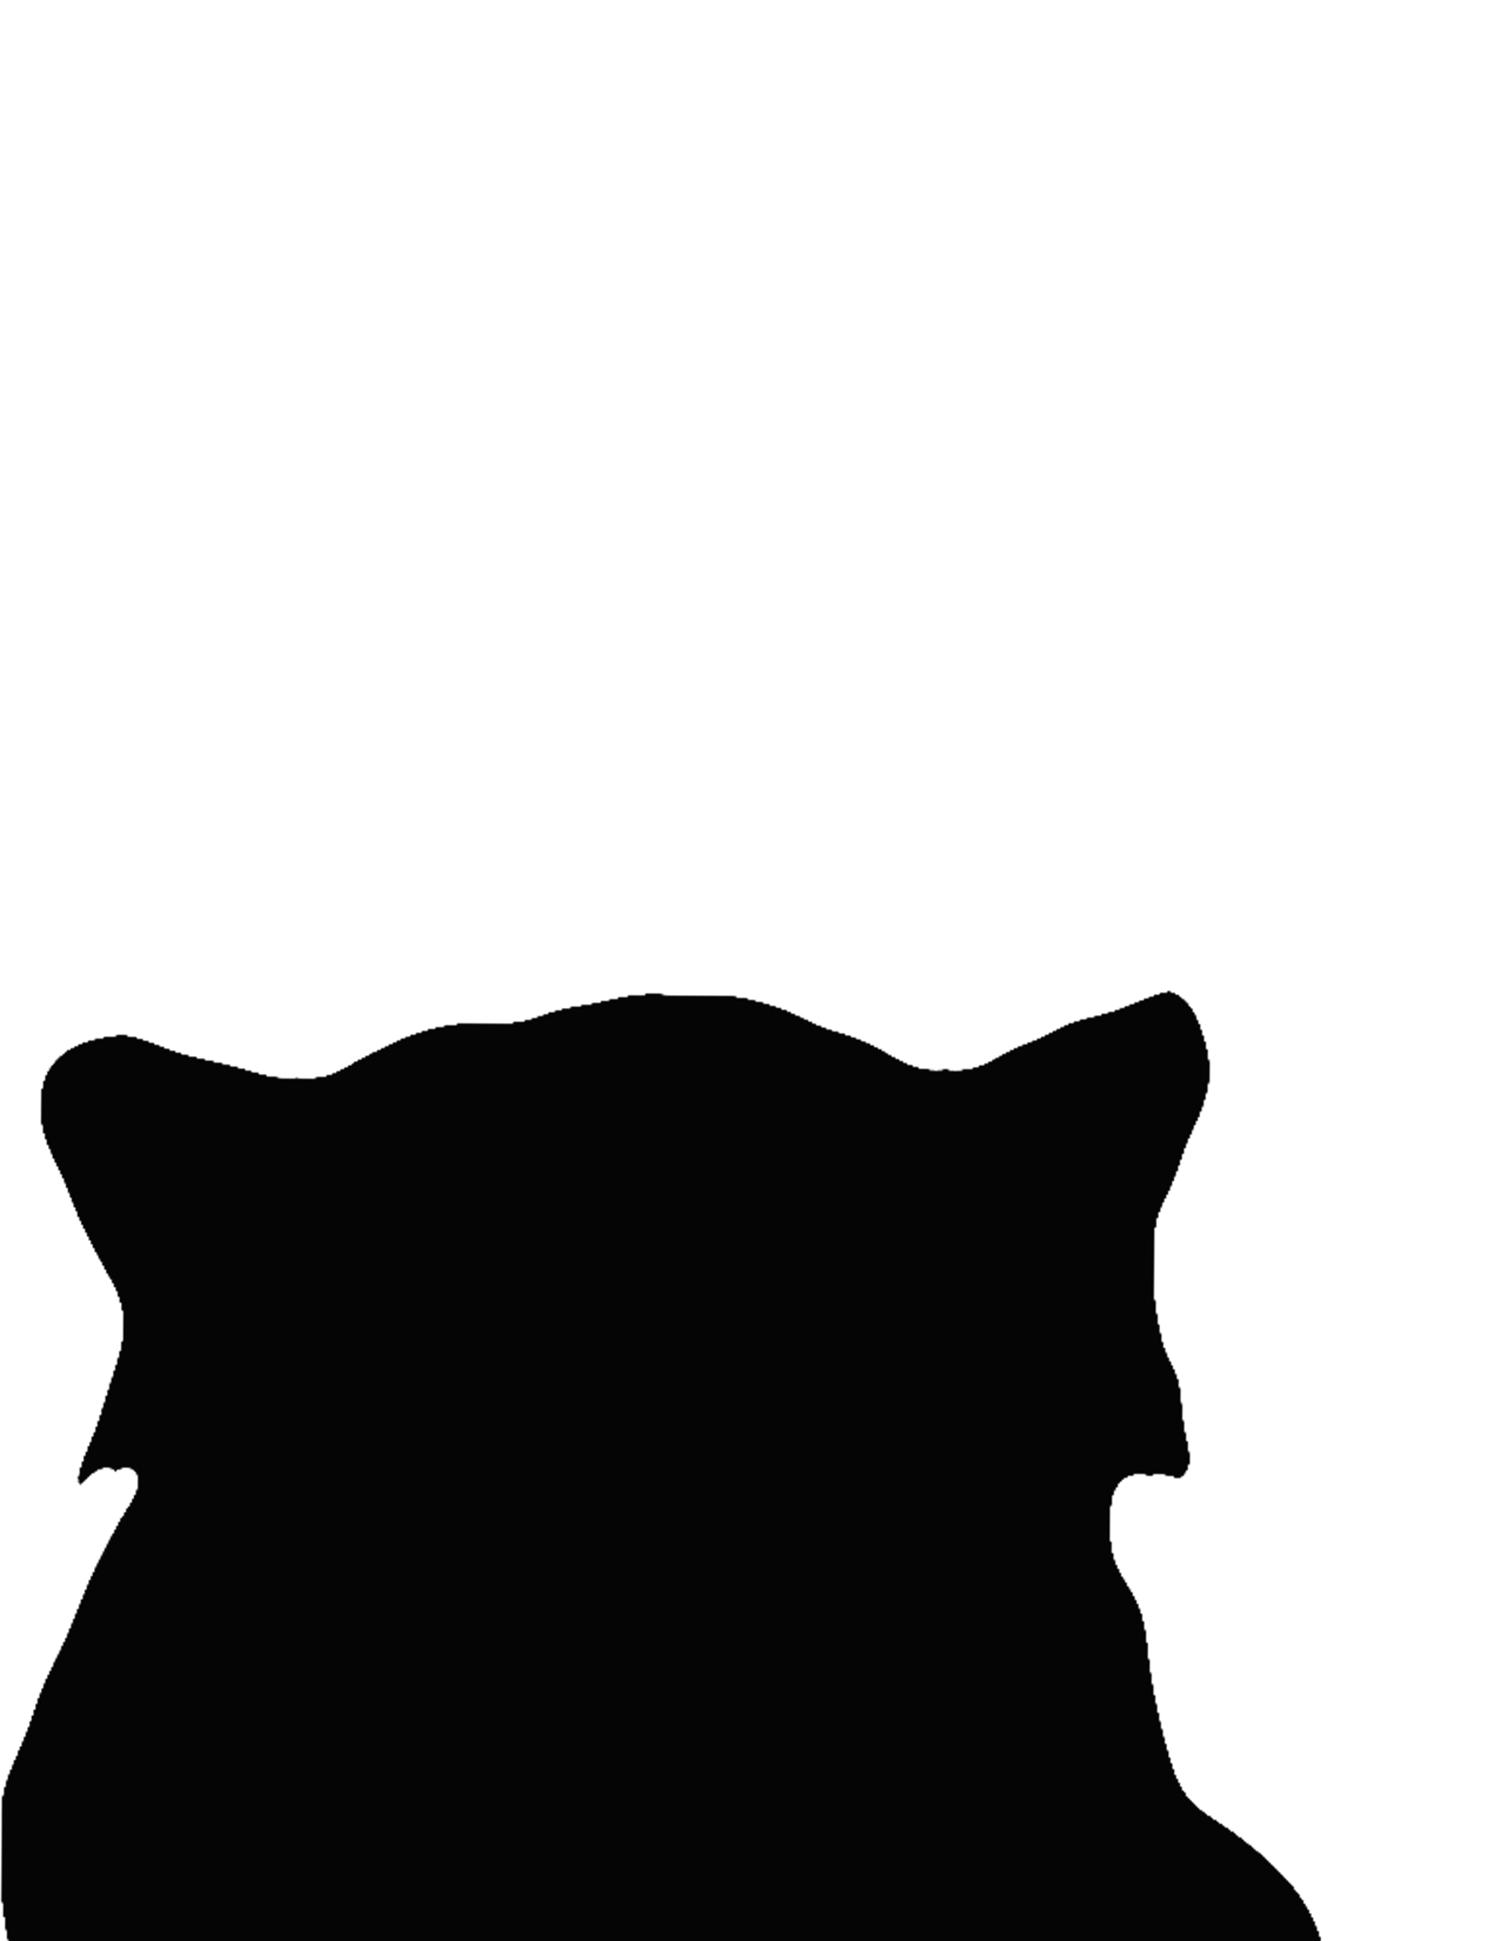 1500x1941 Red Panda Silhouette Photoshop